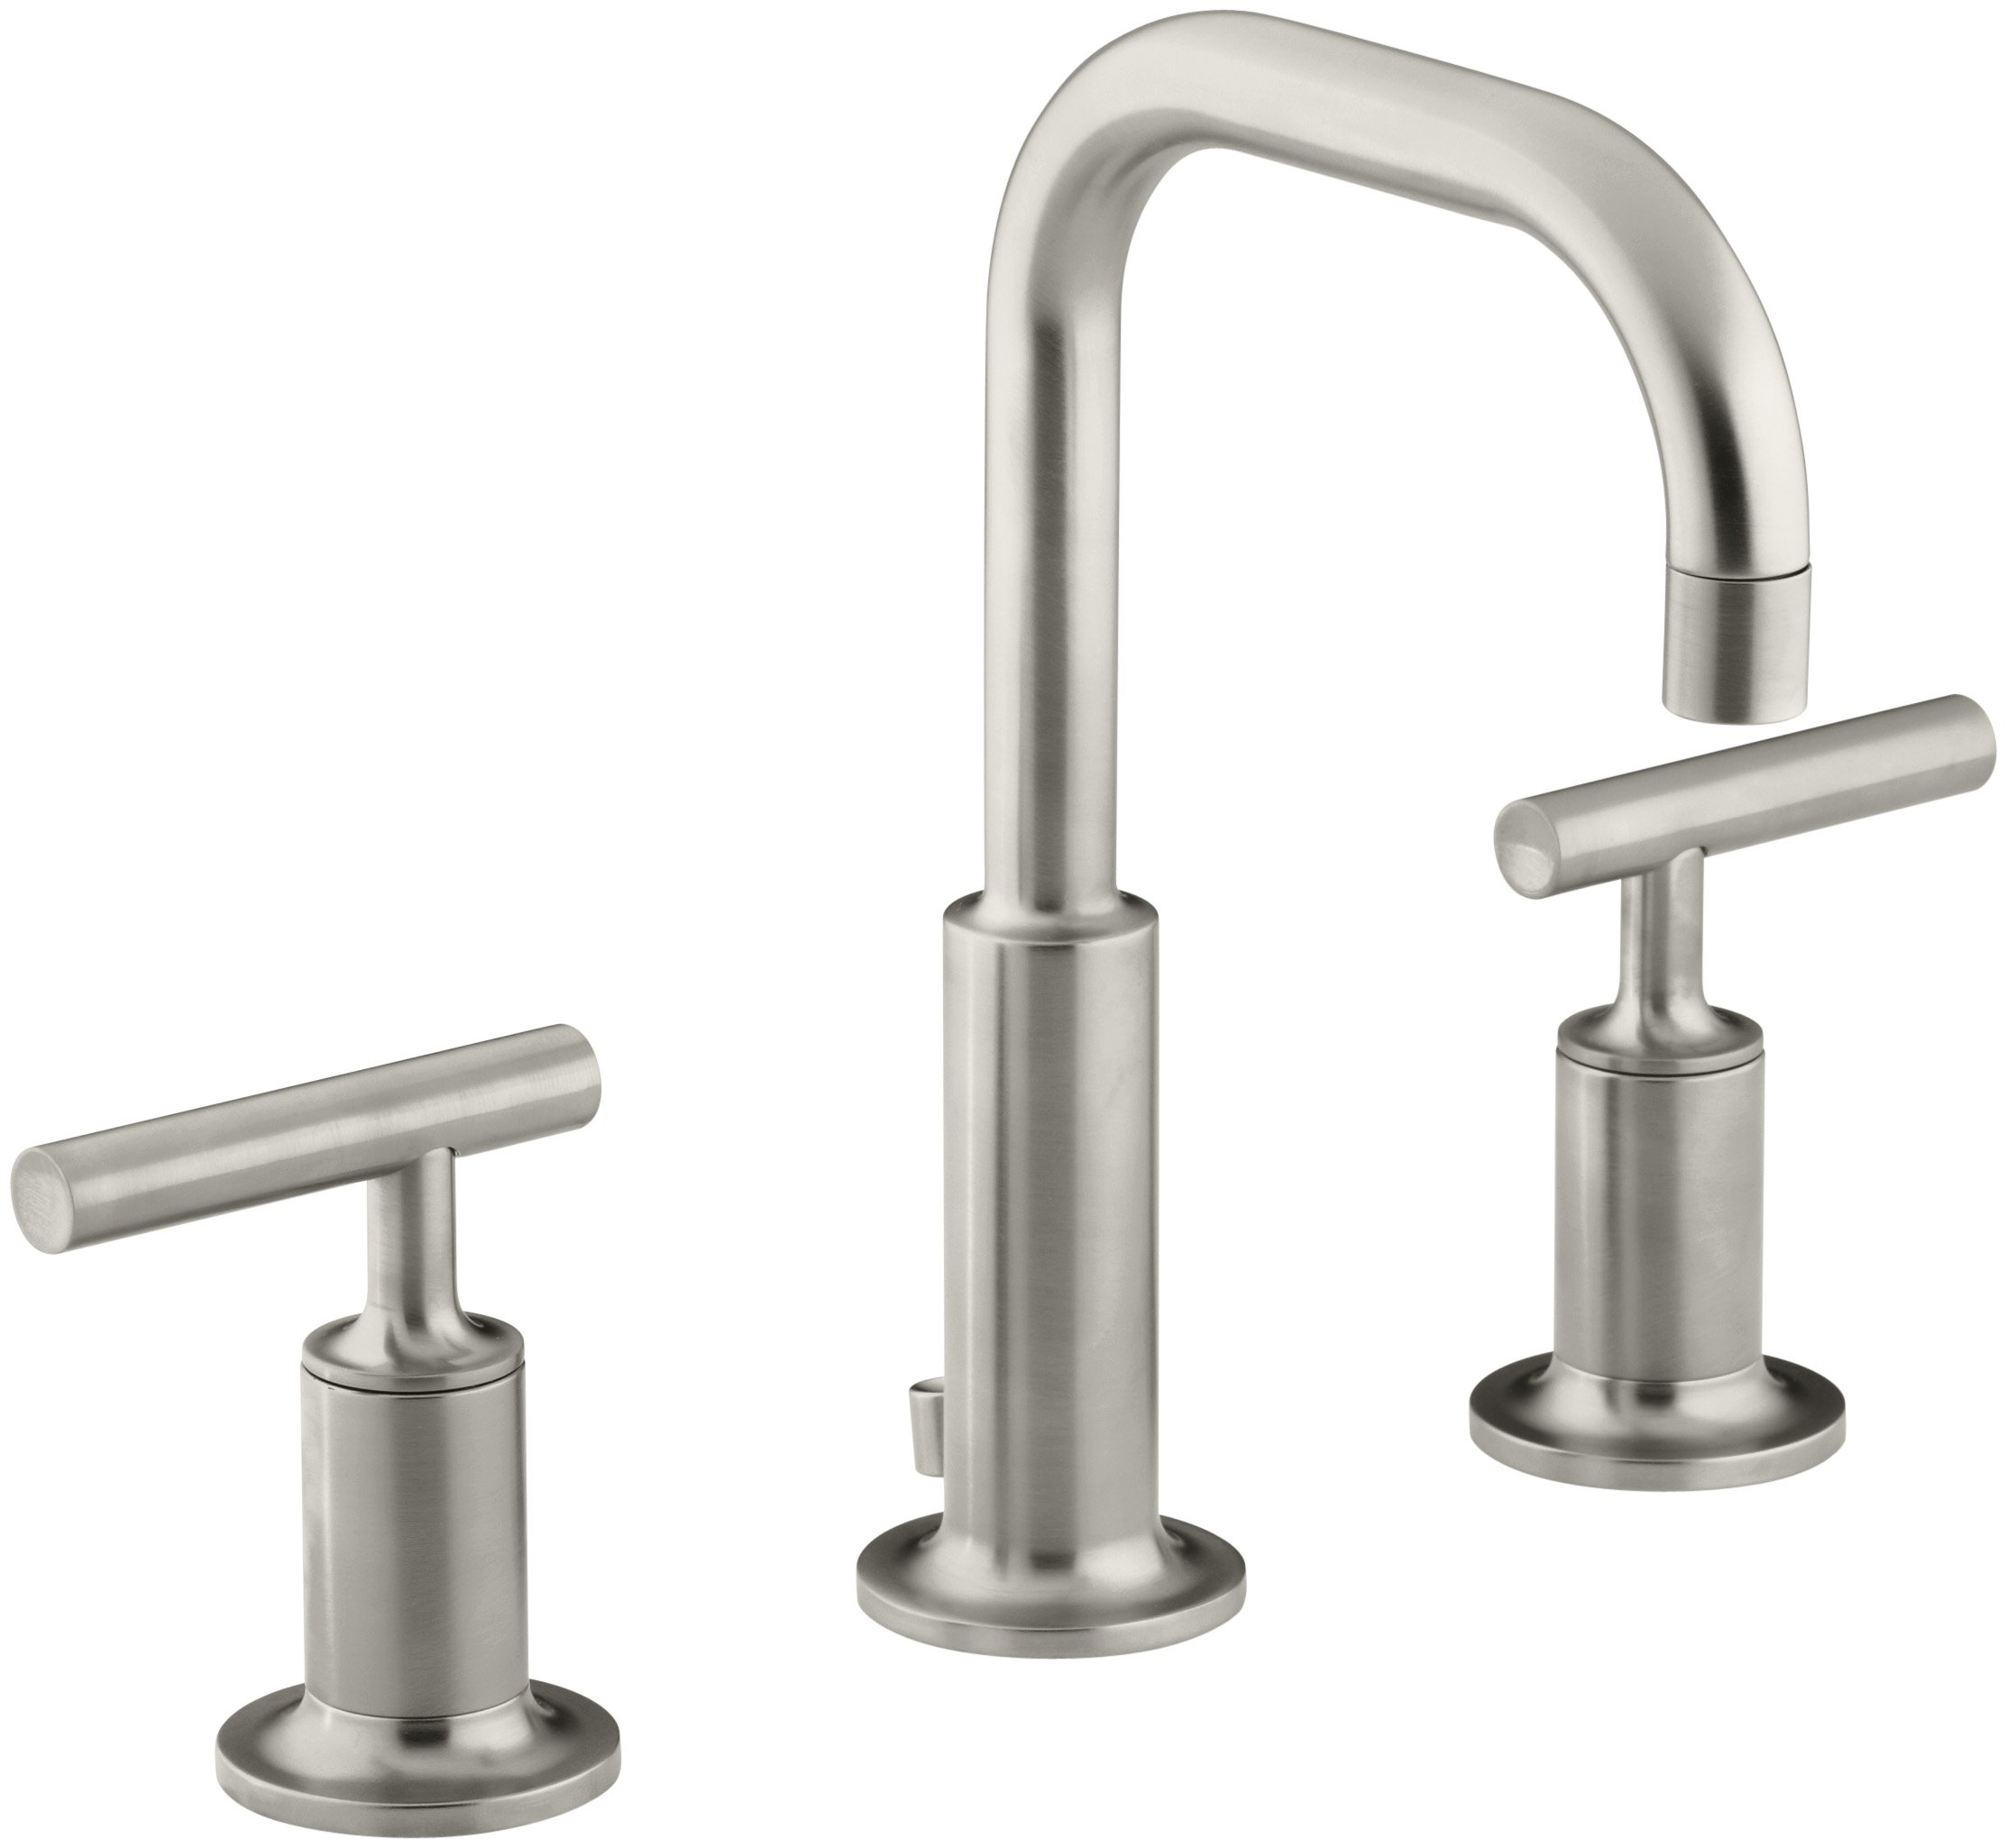 KOHLER K-14406-4-BN Purist Widespread Lavatory Faucet, Vibrant Brushed Nickel